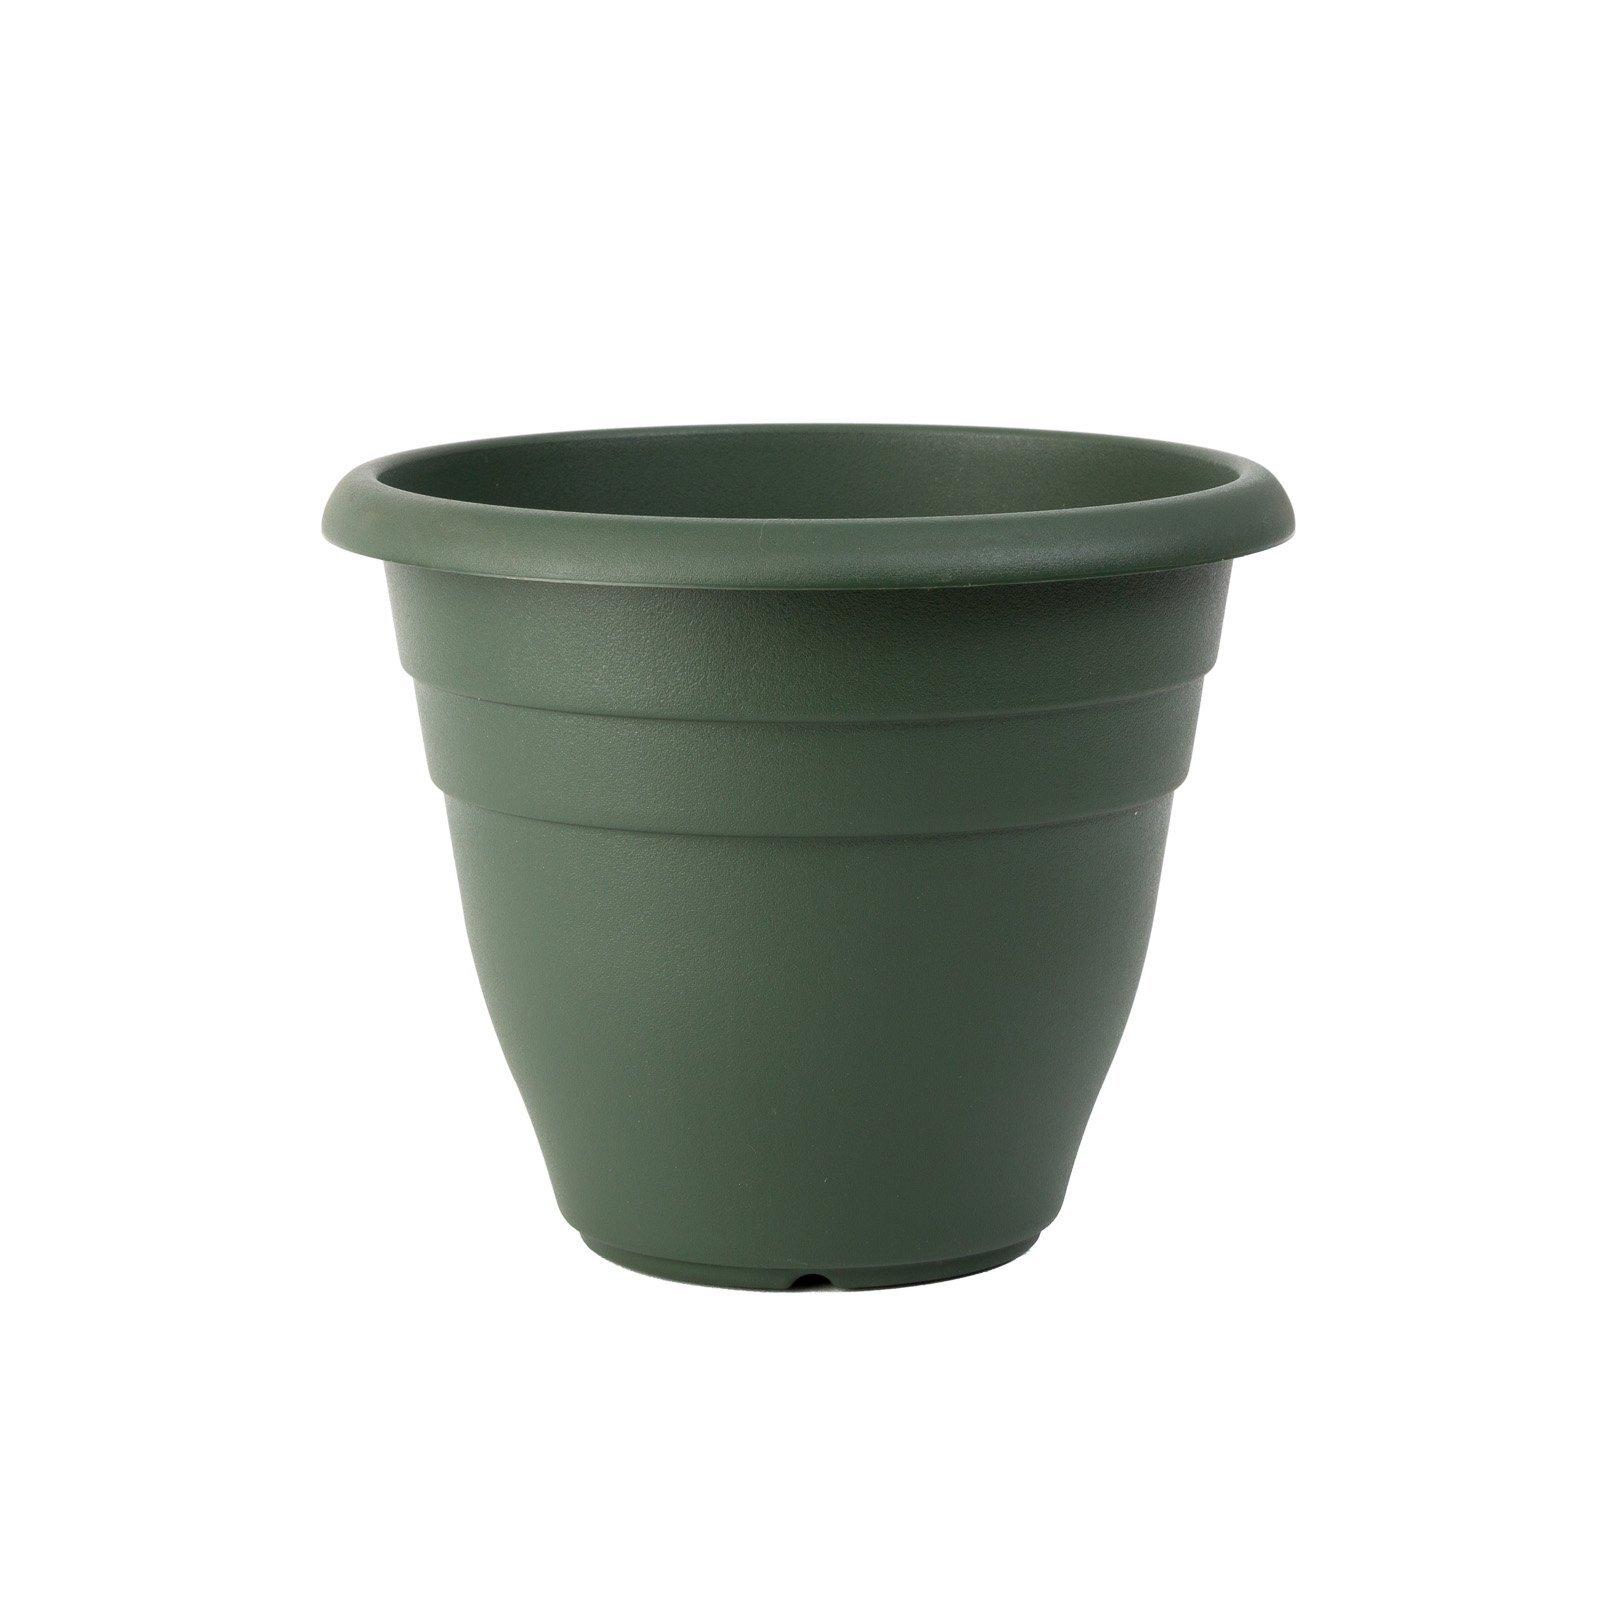 Northcote Pottery 200mm Green Villa Round Plastic Pot